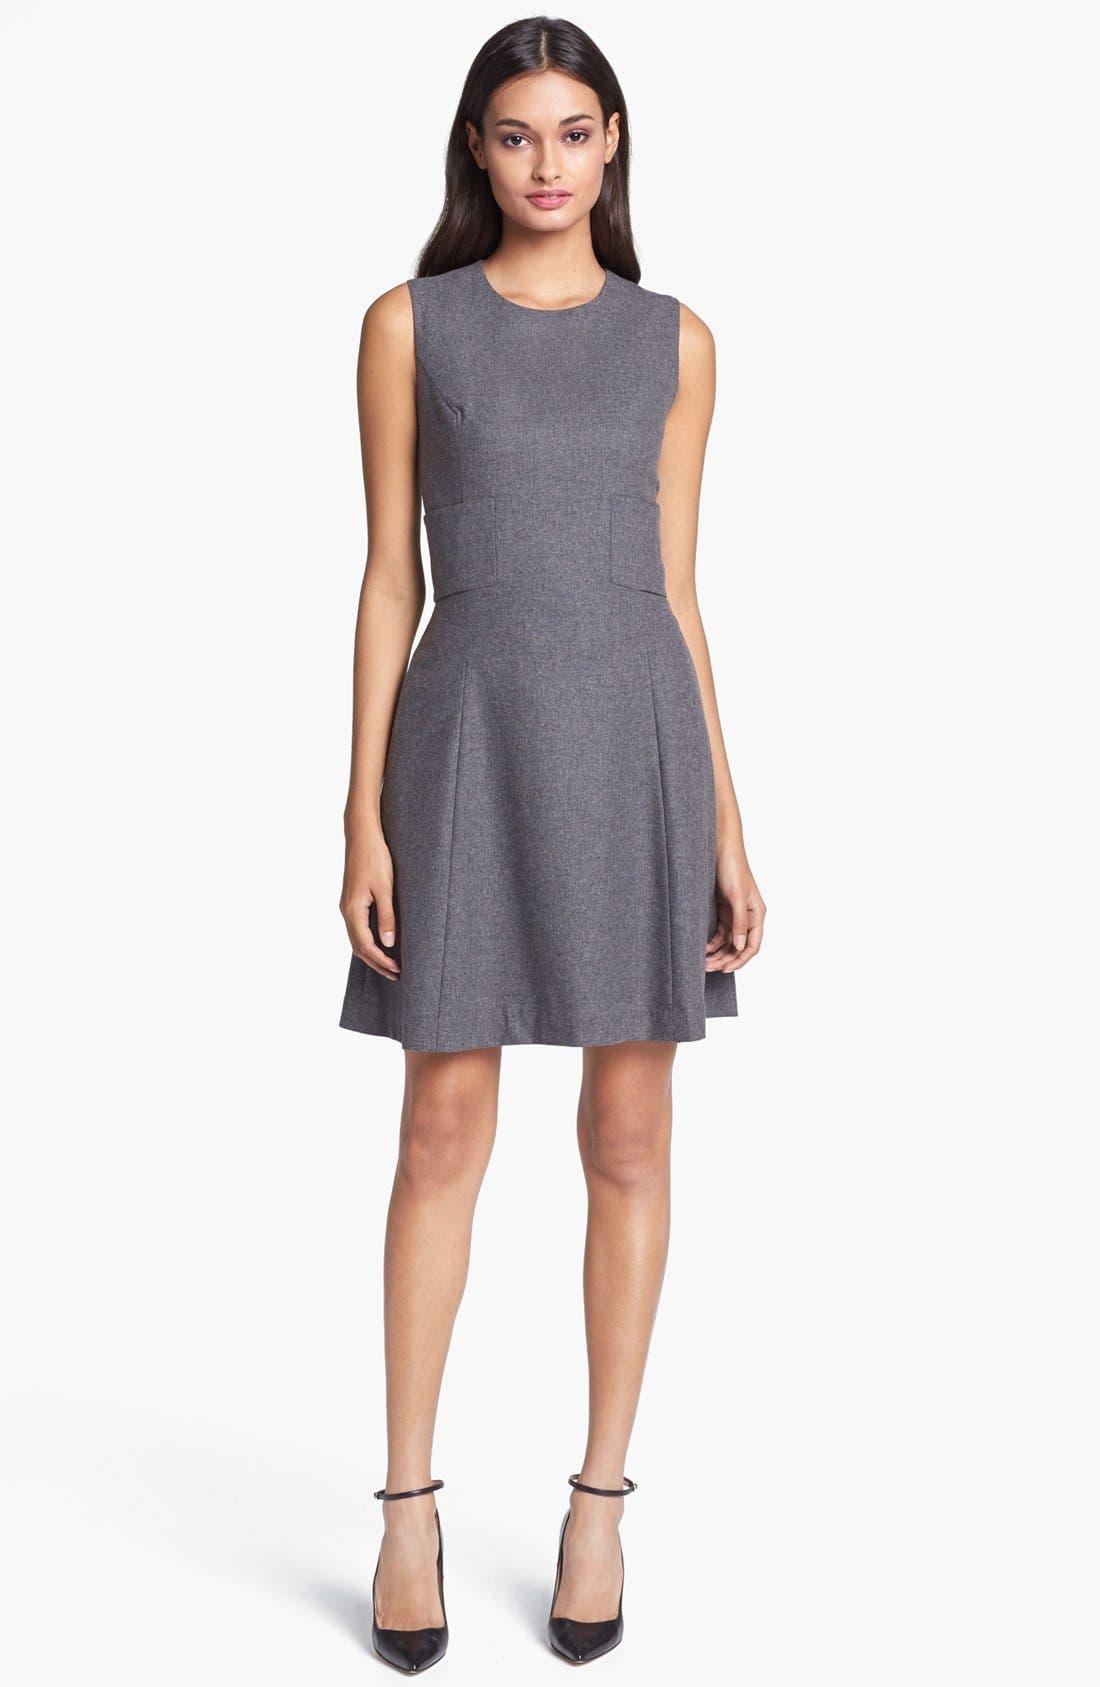 Main Image - kate spade new york 'marti' wool blend a-line dress